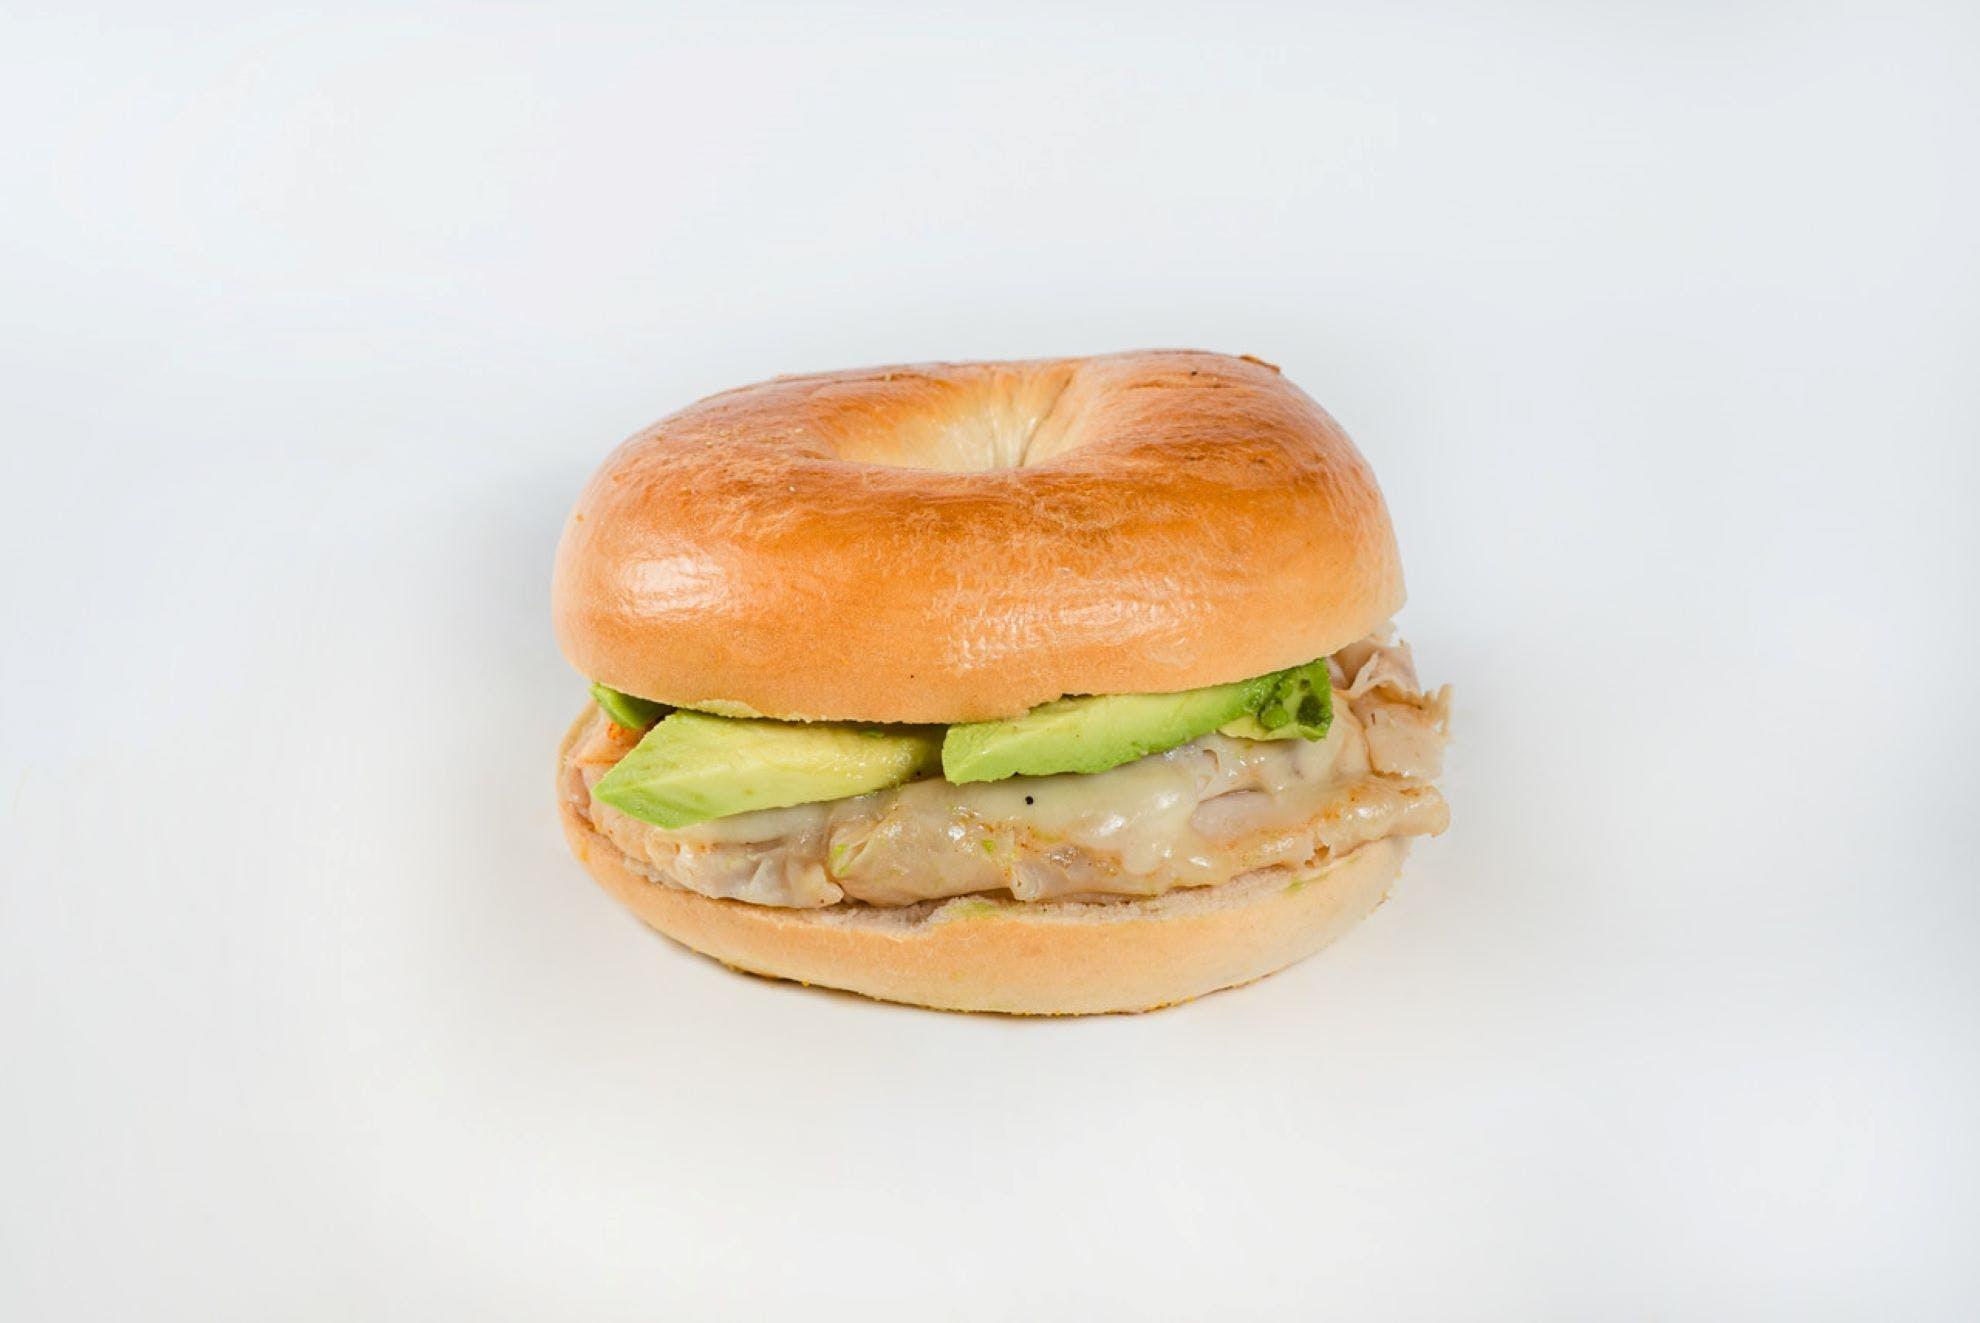 Chaz Bagel Sandwich from Gandolfo's New York Deli - American Fork in American Fork, UT